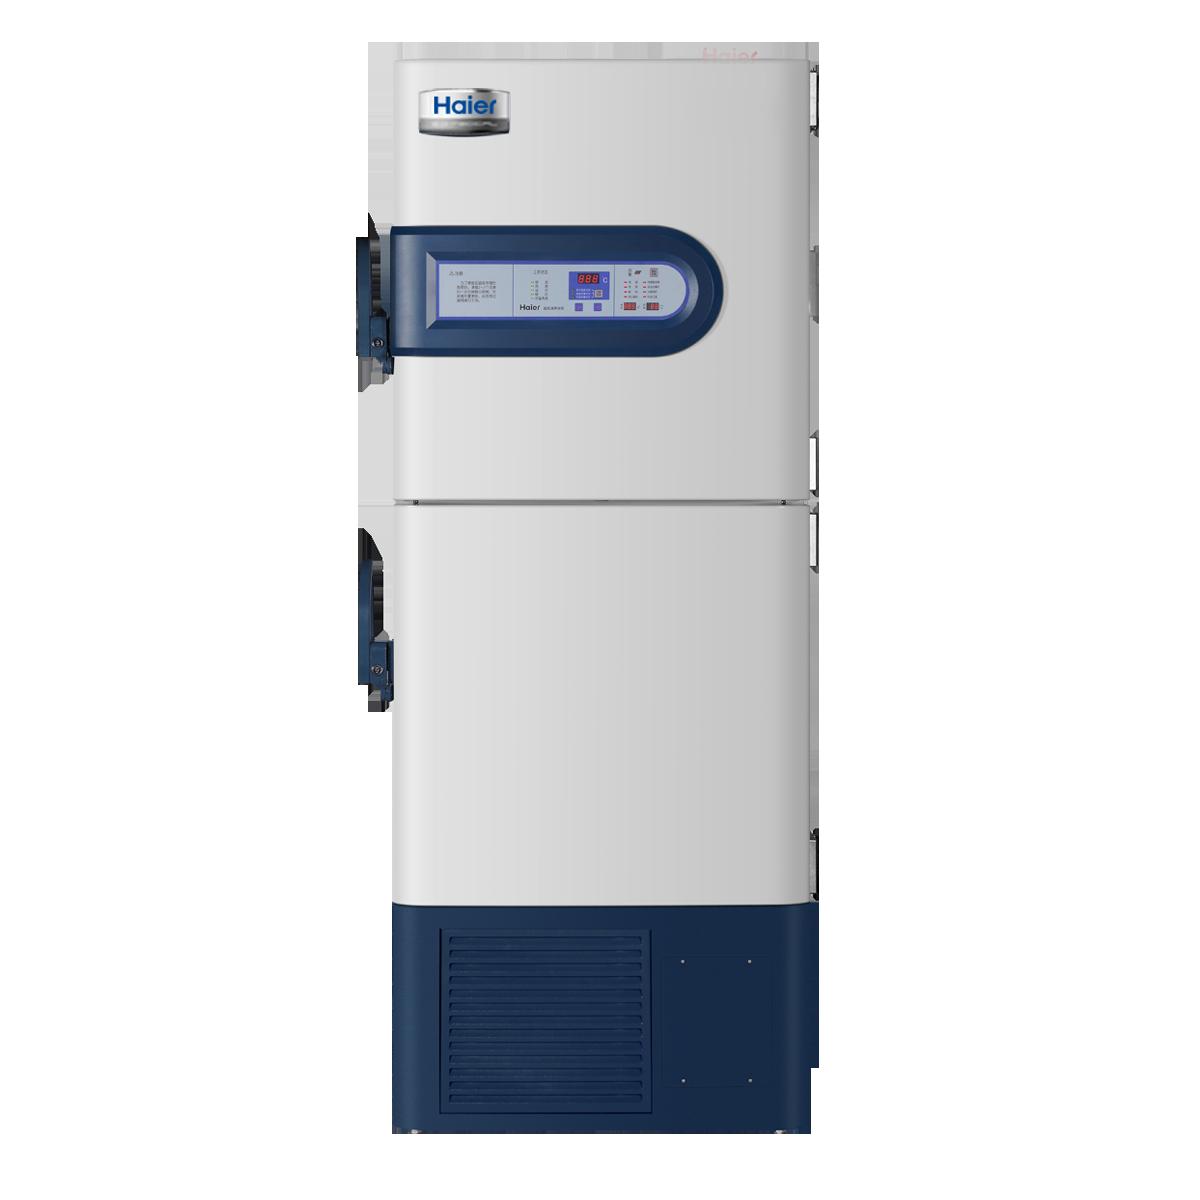 -86℃超低温保存箱(双开门超低温冰箱)DW-86L490J